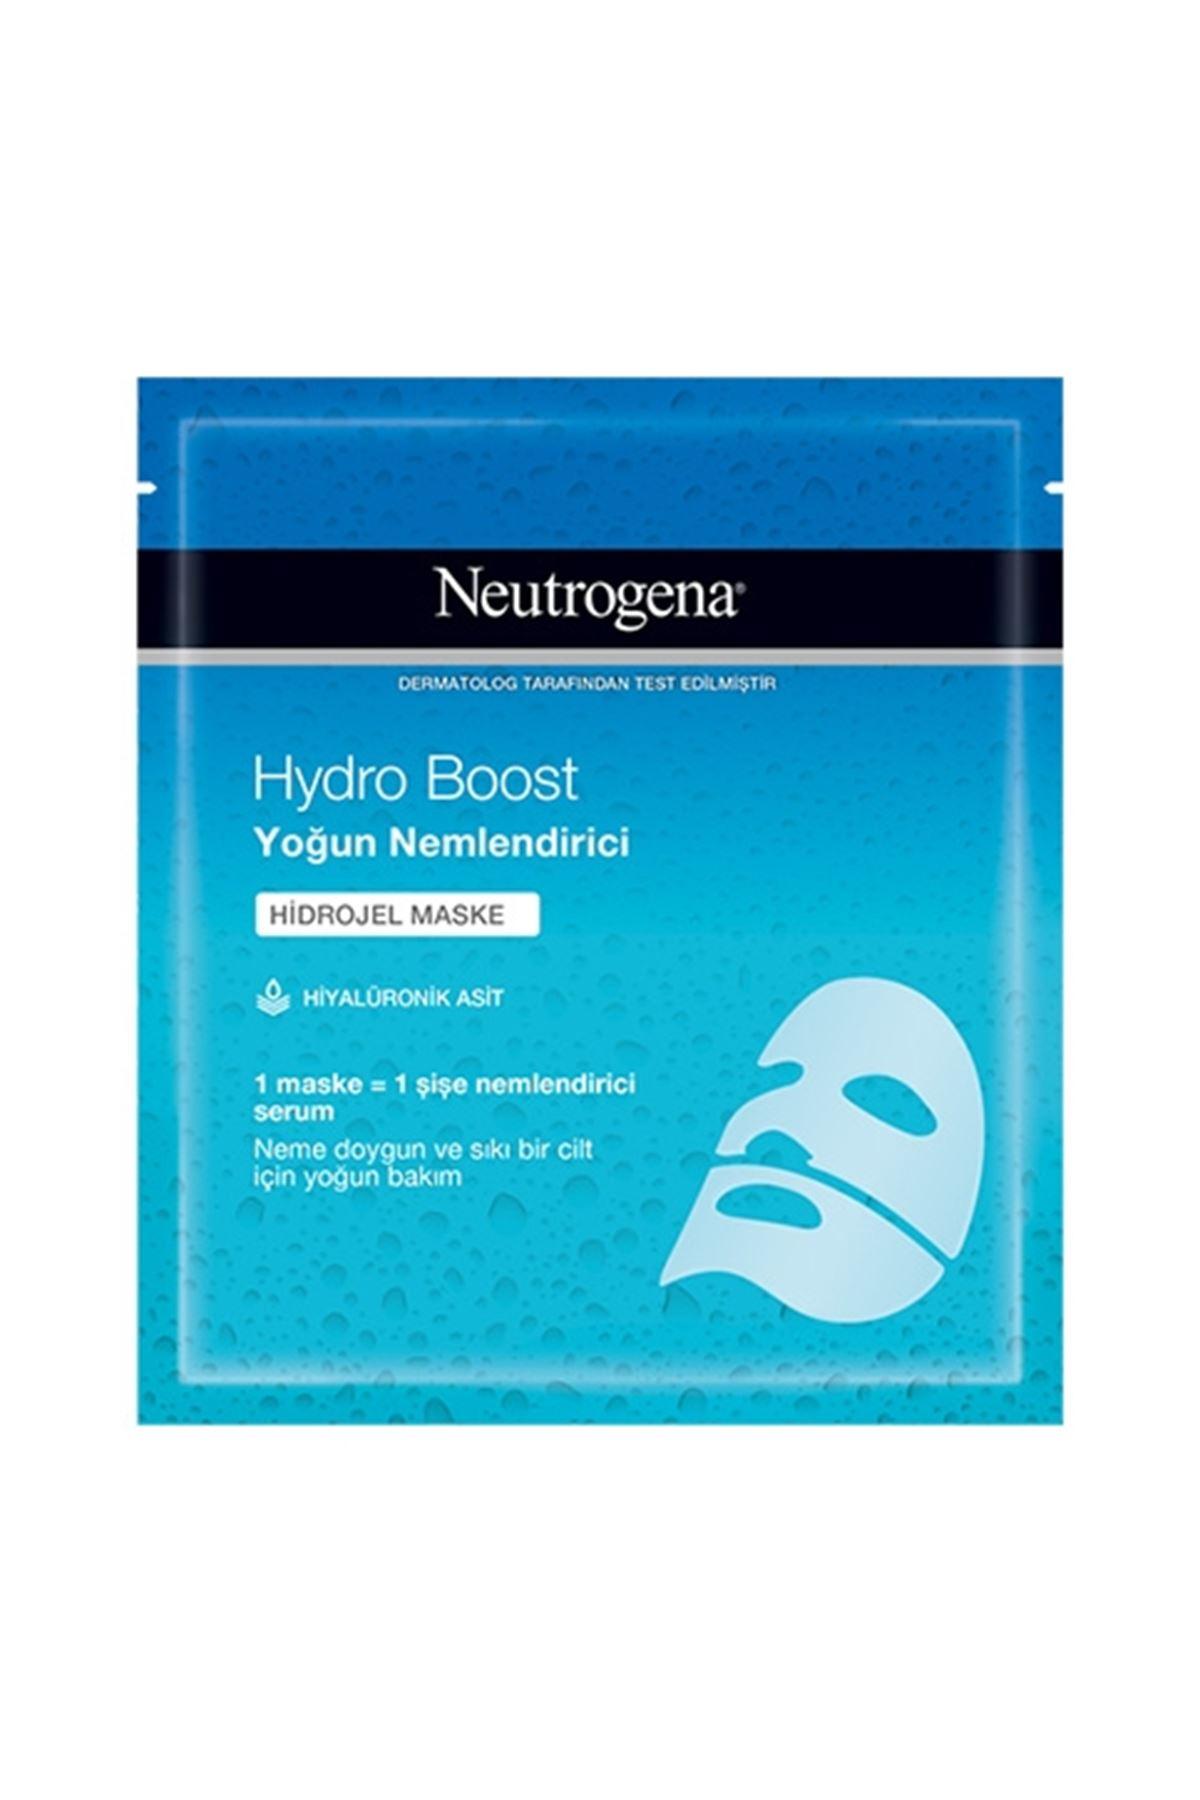 Neutrogena Hydro Boost Yoğun Nemlendirici Hidrojel Maske 30 ML